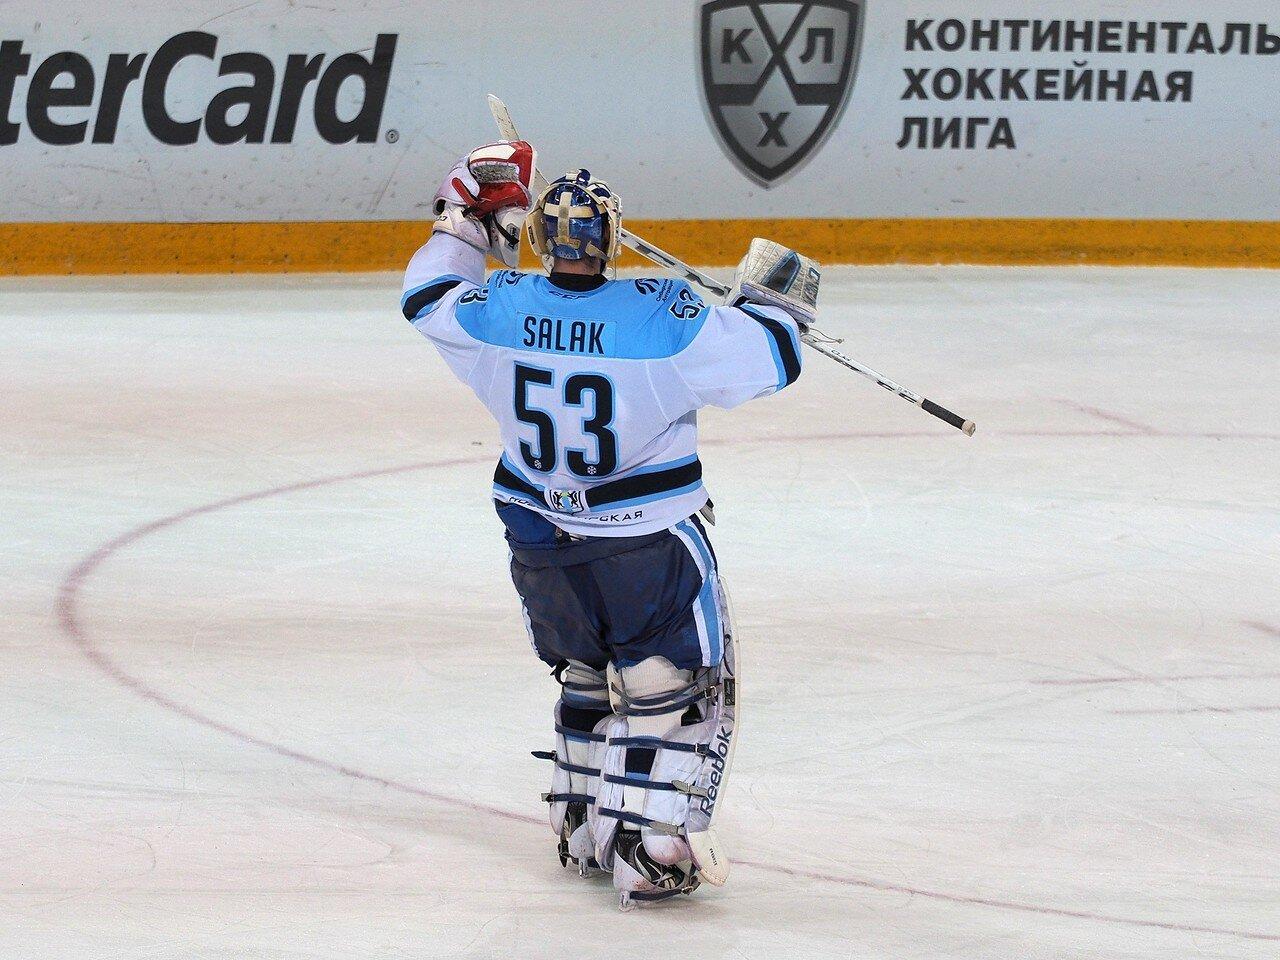 116Плей-офф 2016 Восток 1/2 Металлург - Сибирь 10.03.2016